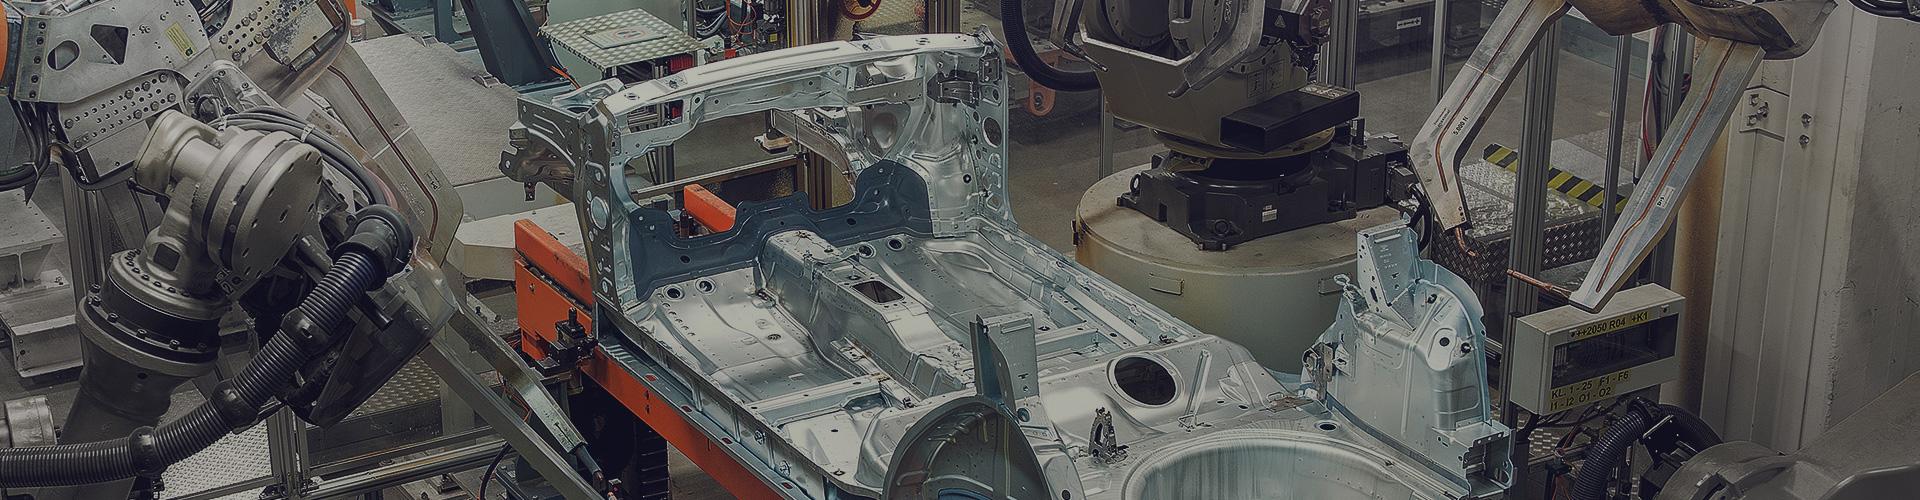 Automotive picture WEMO homepage